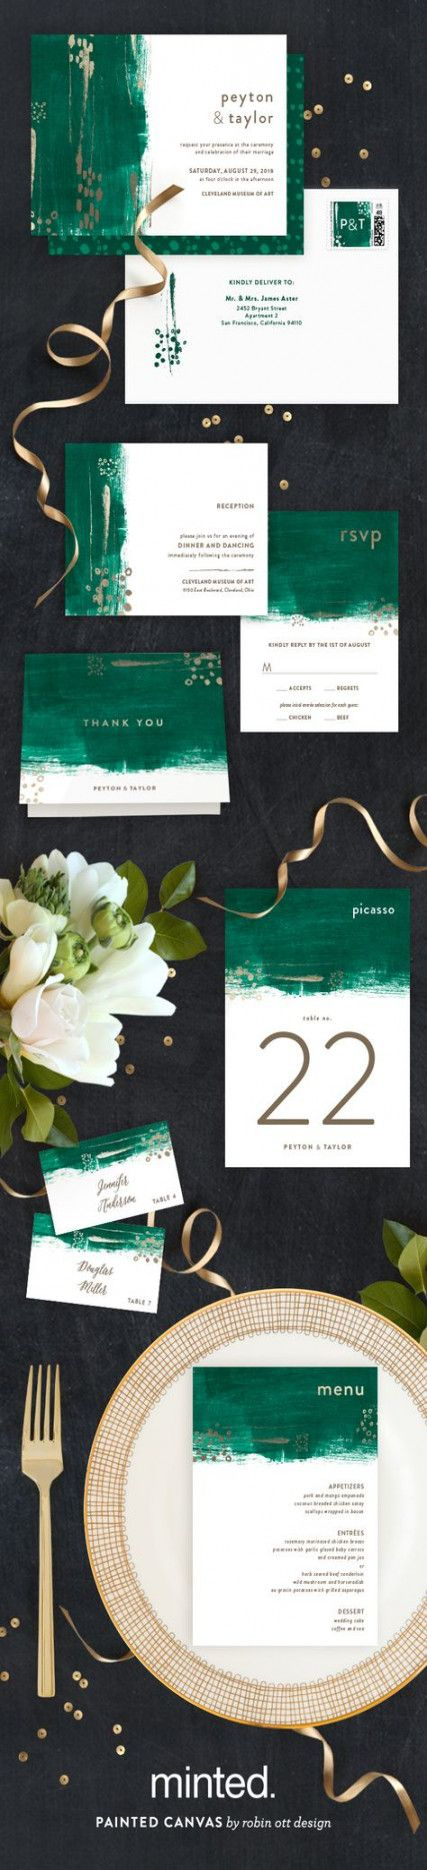 Wedding card ideas water colors 61 Super ideas #wedding